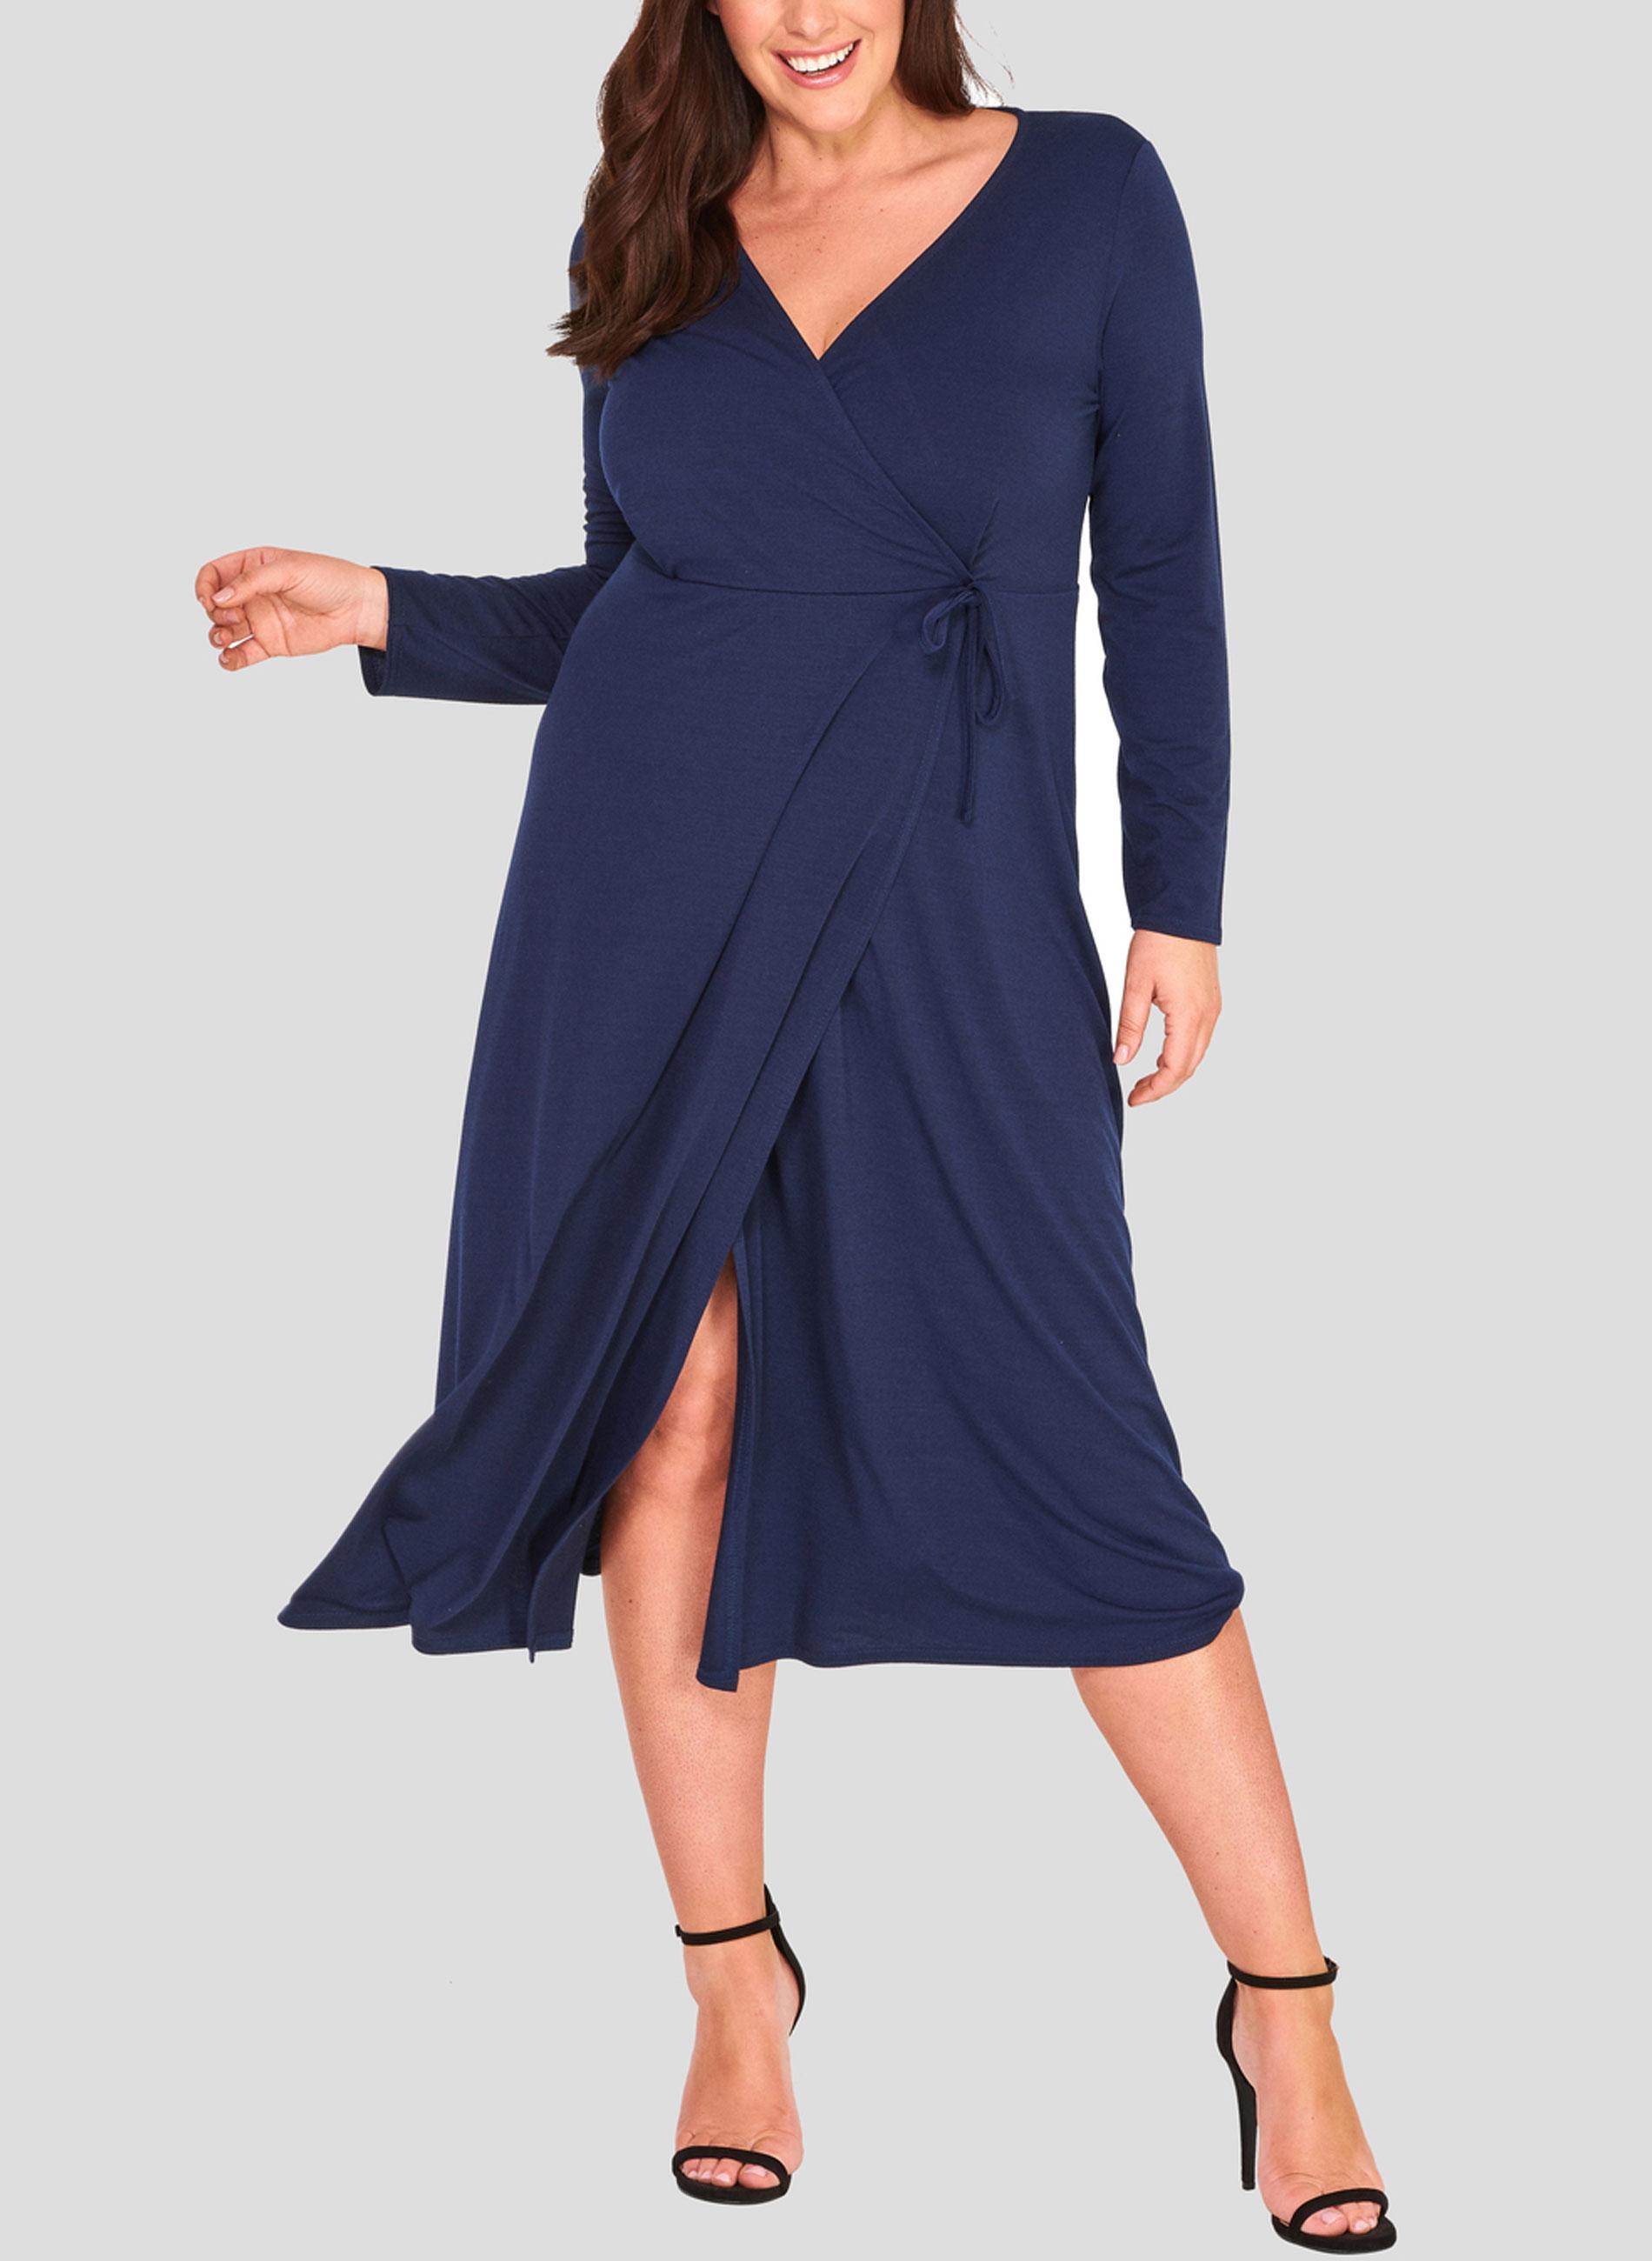 1defe2c04686 ΜΕΓΑΛΑ ΜΕΓΕΘΗ ΦΟΡΕΜΑΤΑ :: Φόρεμα Κρουαζέ Navy - Μόδα σε μεγάλα ...